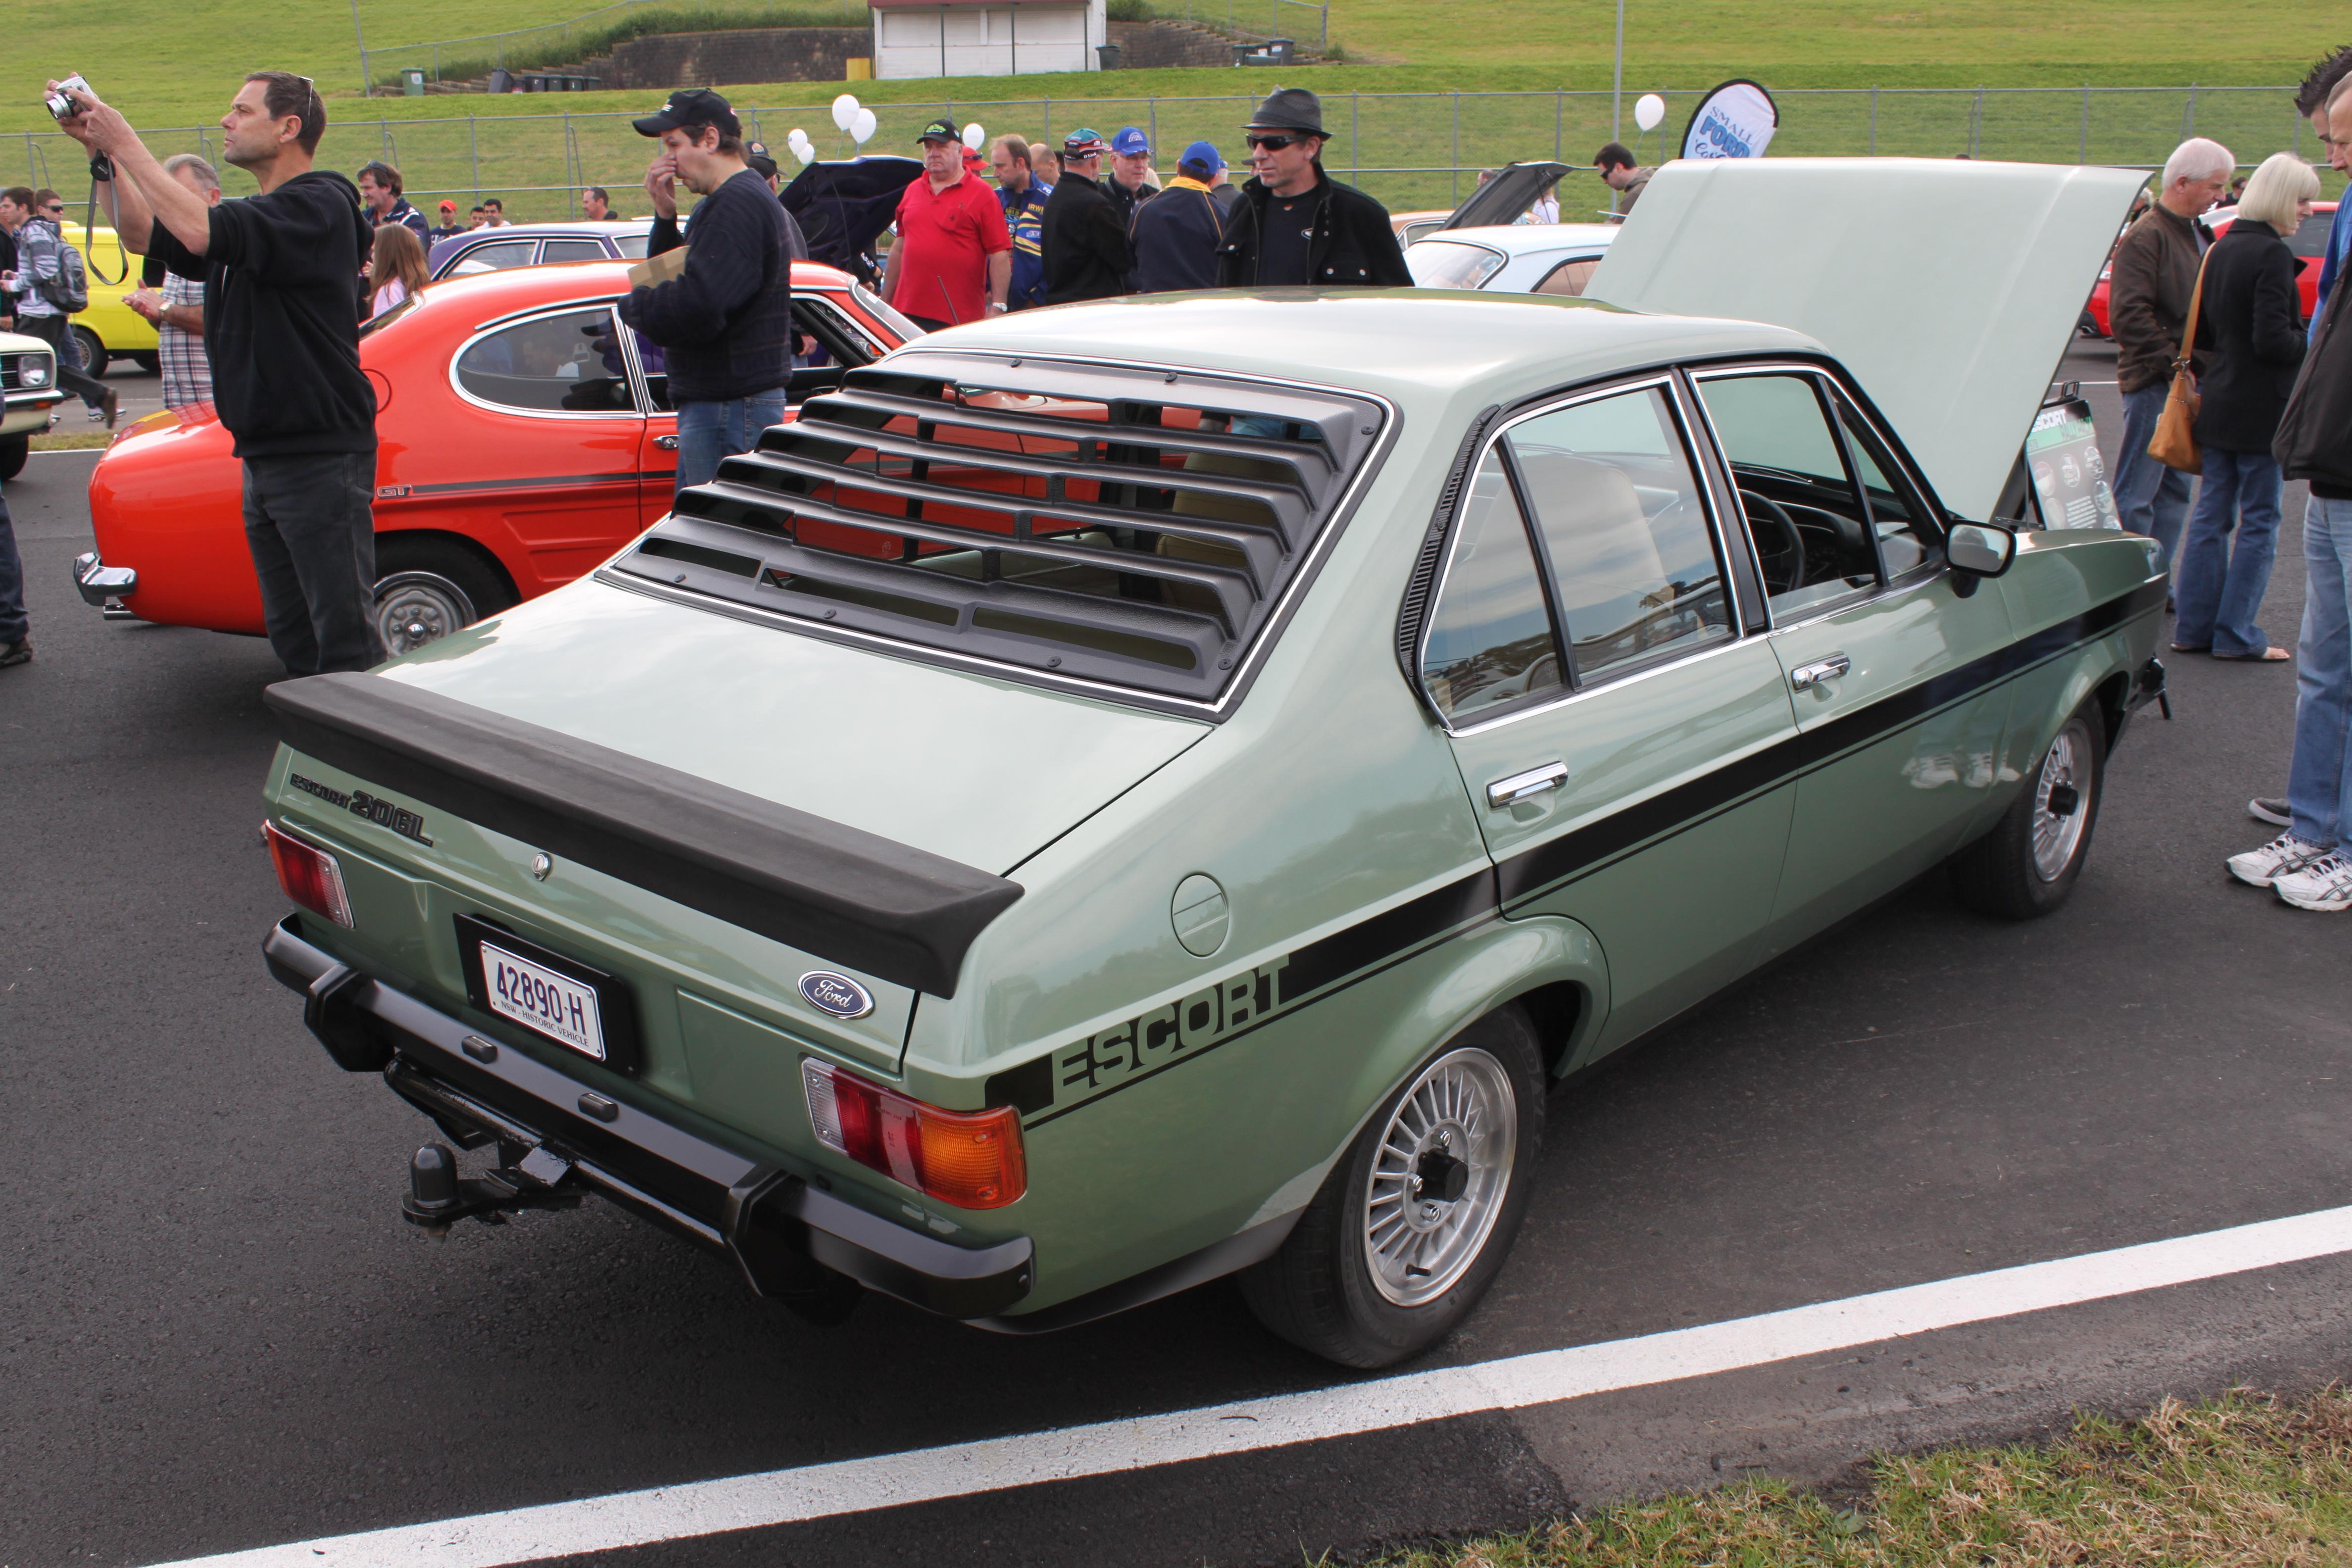 File:1978 Ford Escort (Mark II) GL Rally Pack 2.0 4-door sedan ...